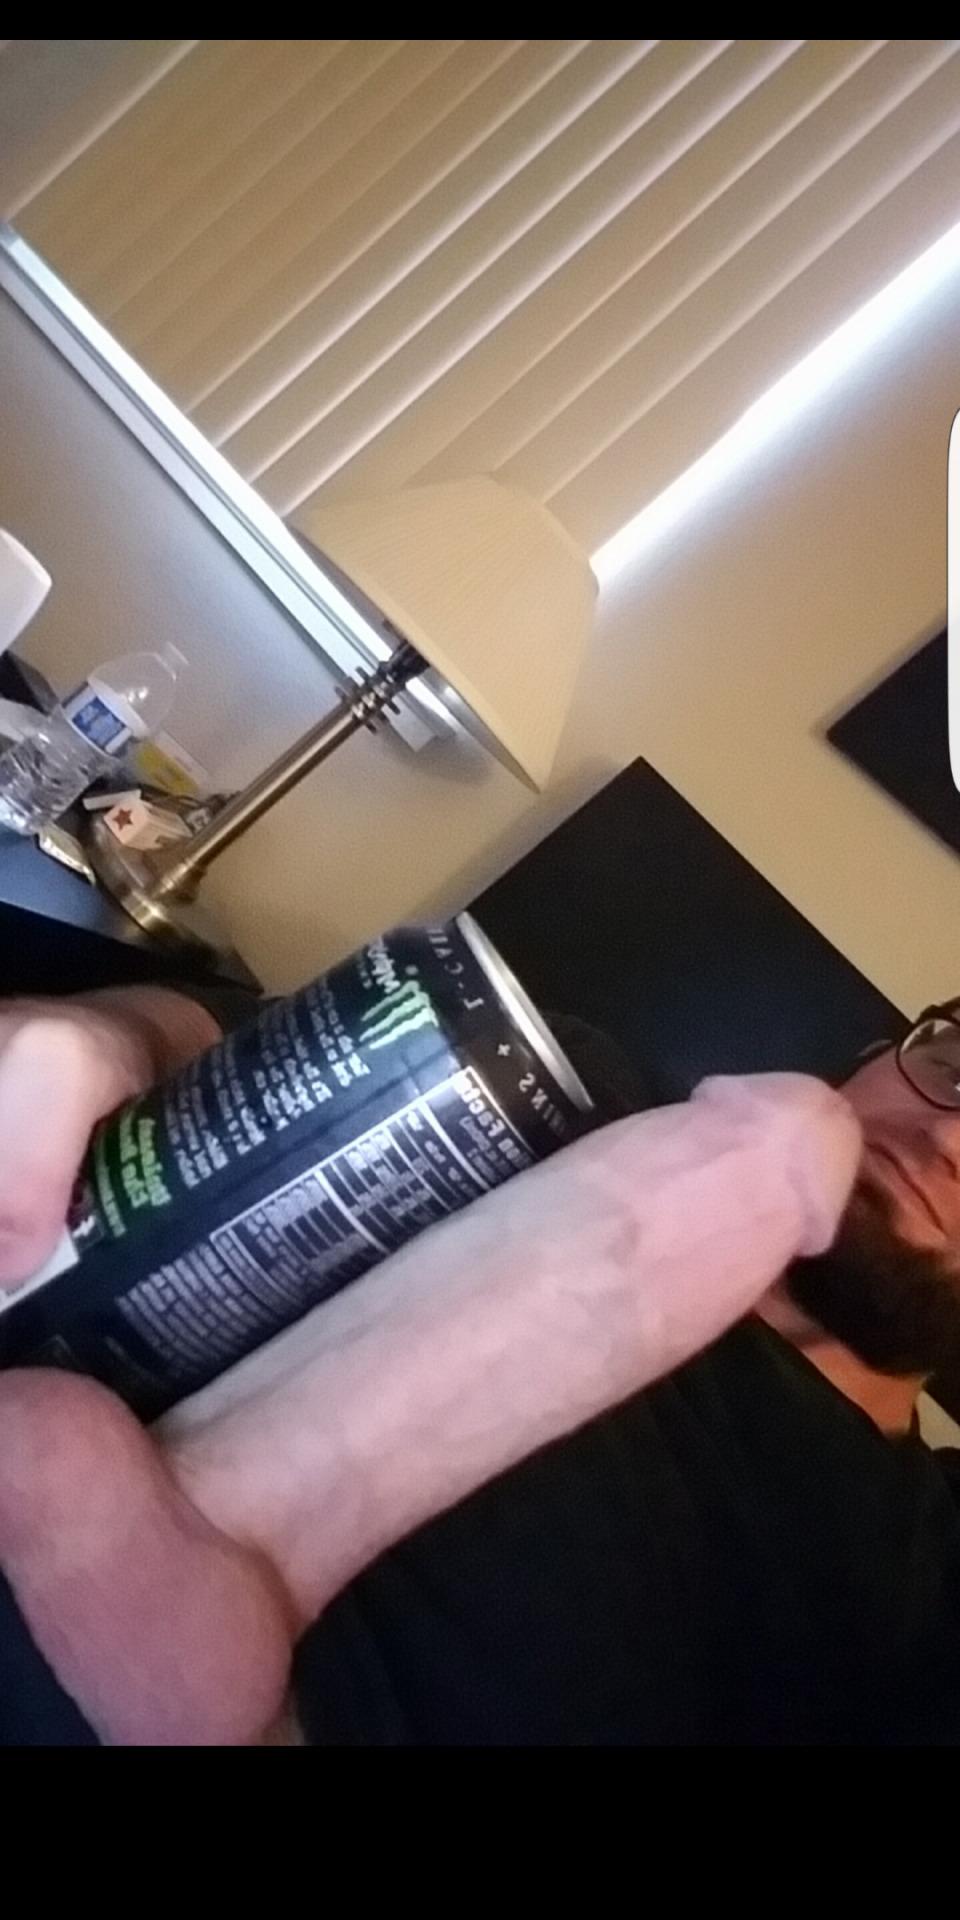 collegecastings:  promiscuouscouple:  promiscuouscouplevids:  Magnum XL on or #fuckrubbersYou decide 😈I'm on team FUCKKKKKKK emBig white  MEATstickHehe DADDYS meat stick🤓